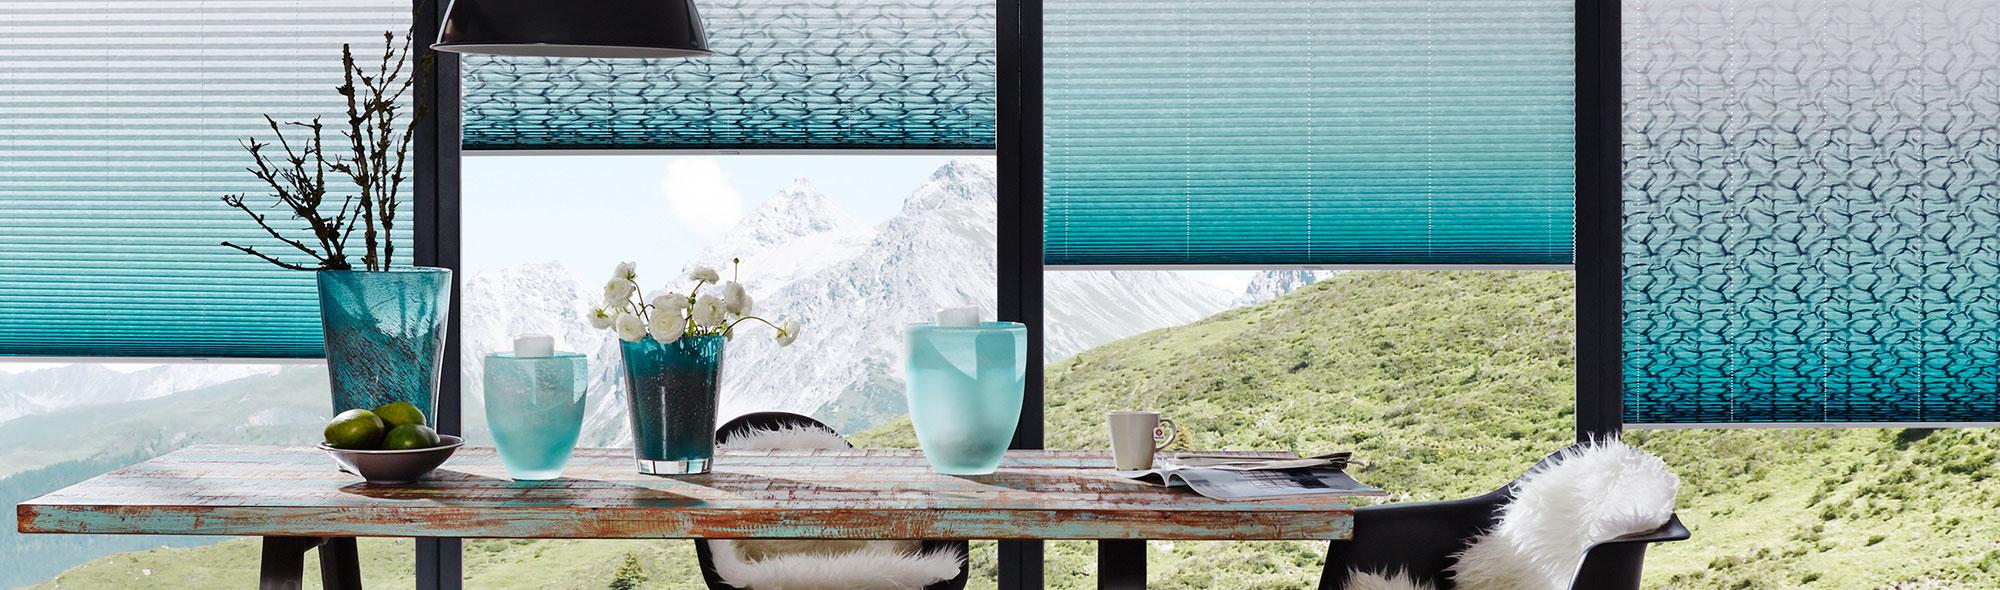 Plissees<br />Individuelle Gestaltung Ihrer Fenster